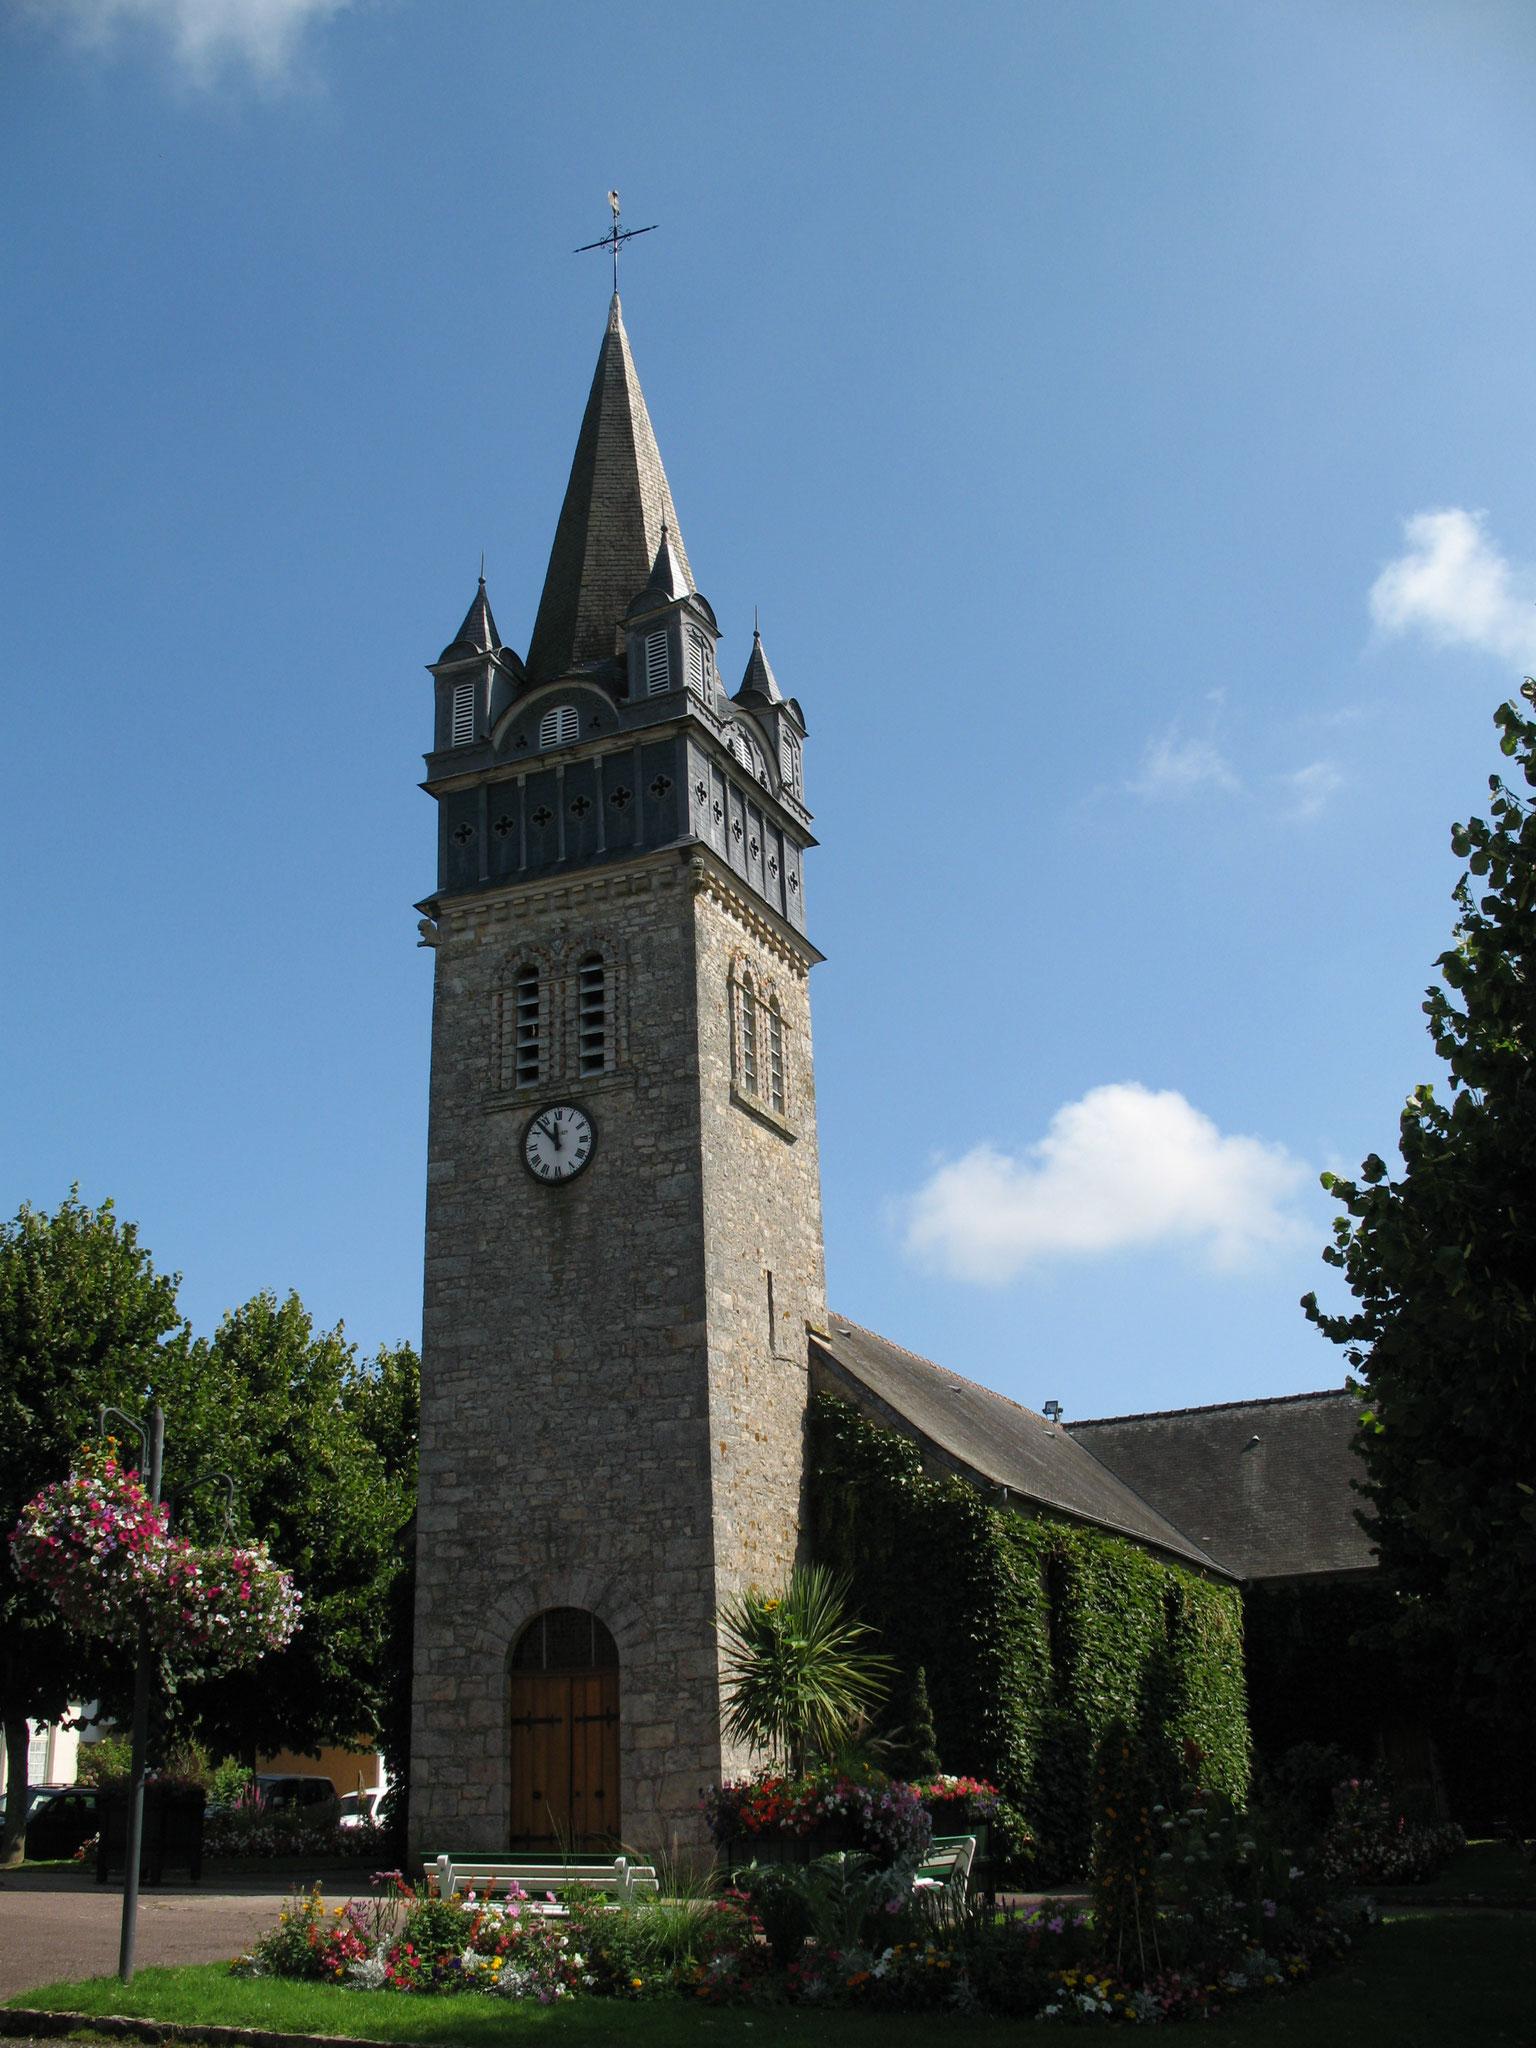 Eglise Sainte Madeleine Bagnoles de l'Orne Normandie